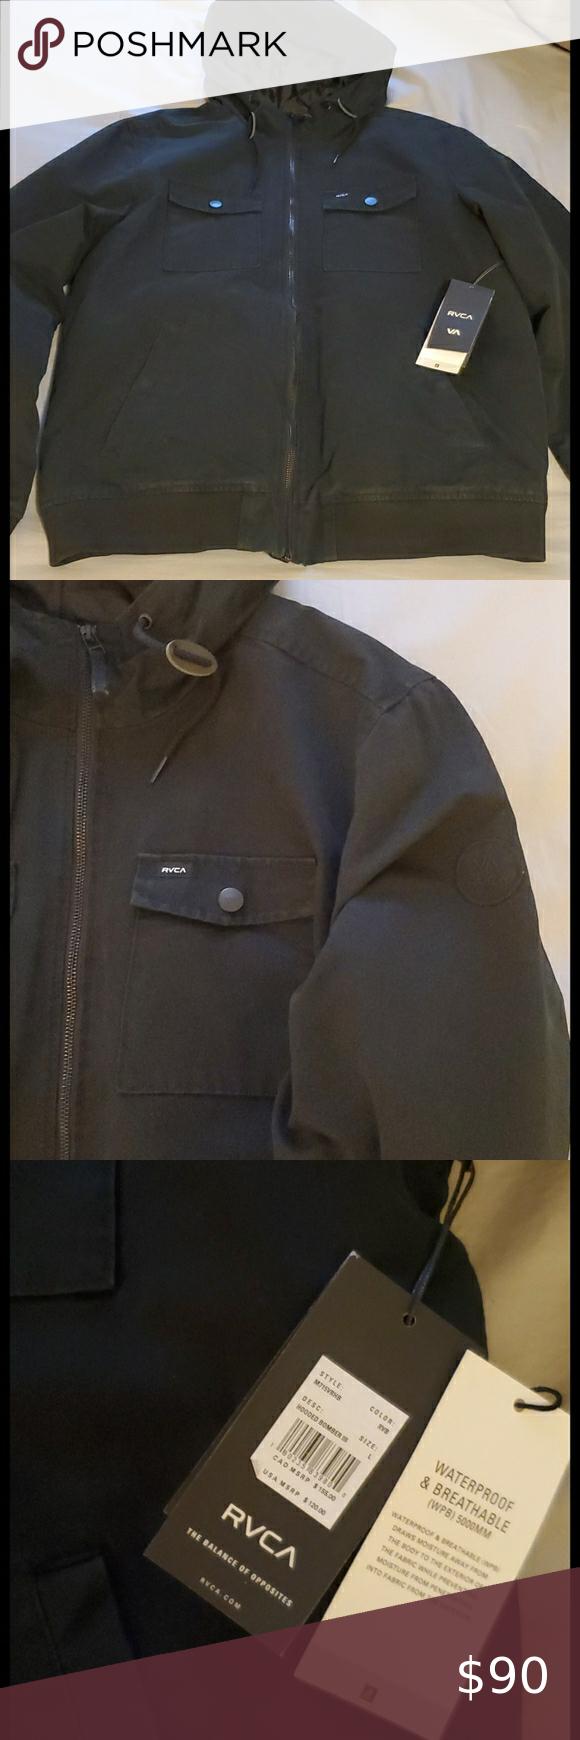 Mens Rvca Hooded Bomber Jacket Hooded Bomber Jacket Bomber Jacket Rvca Jacket [ 1740 x 580 Pixel ]